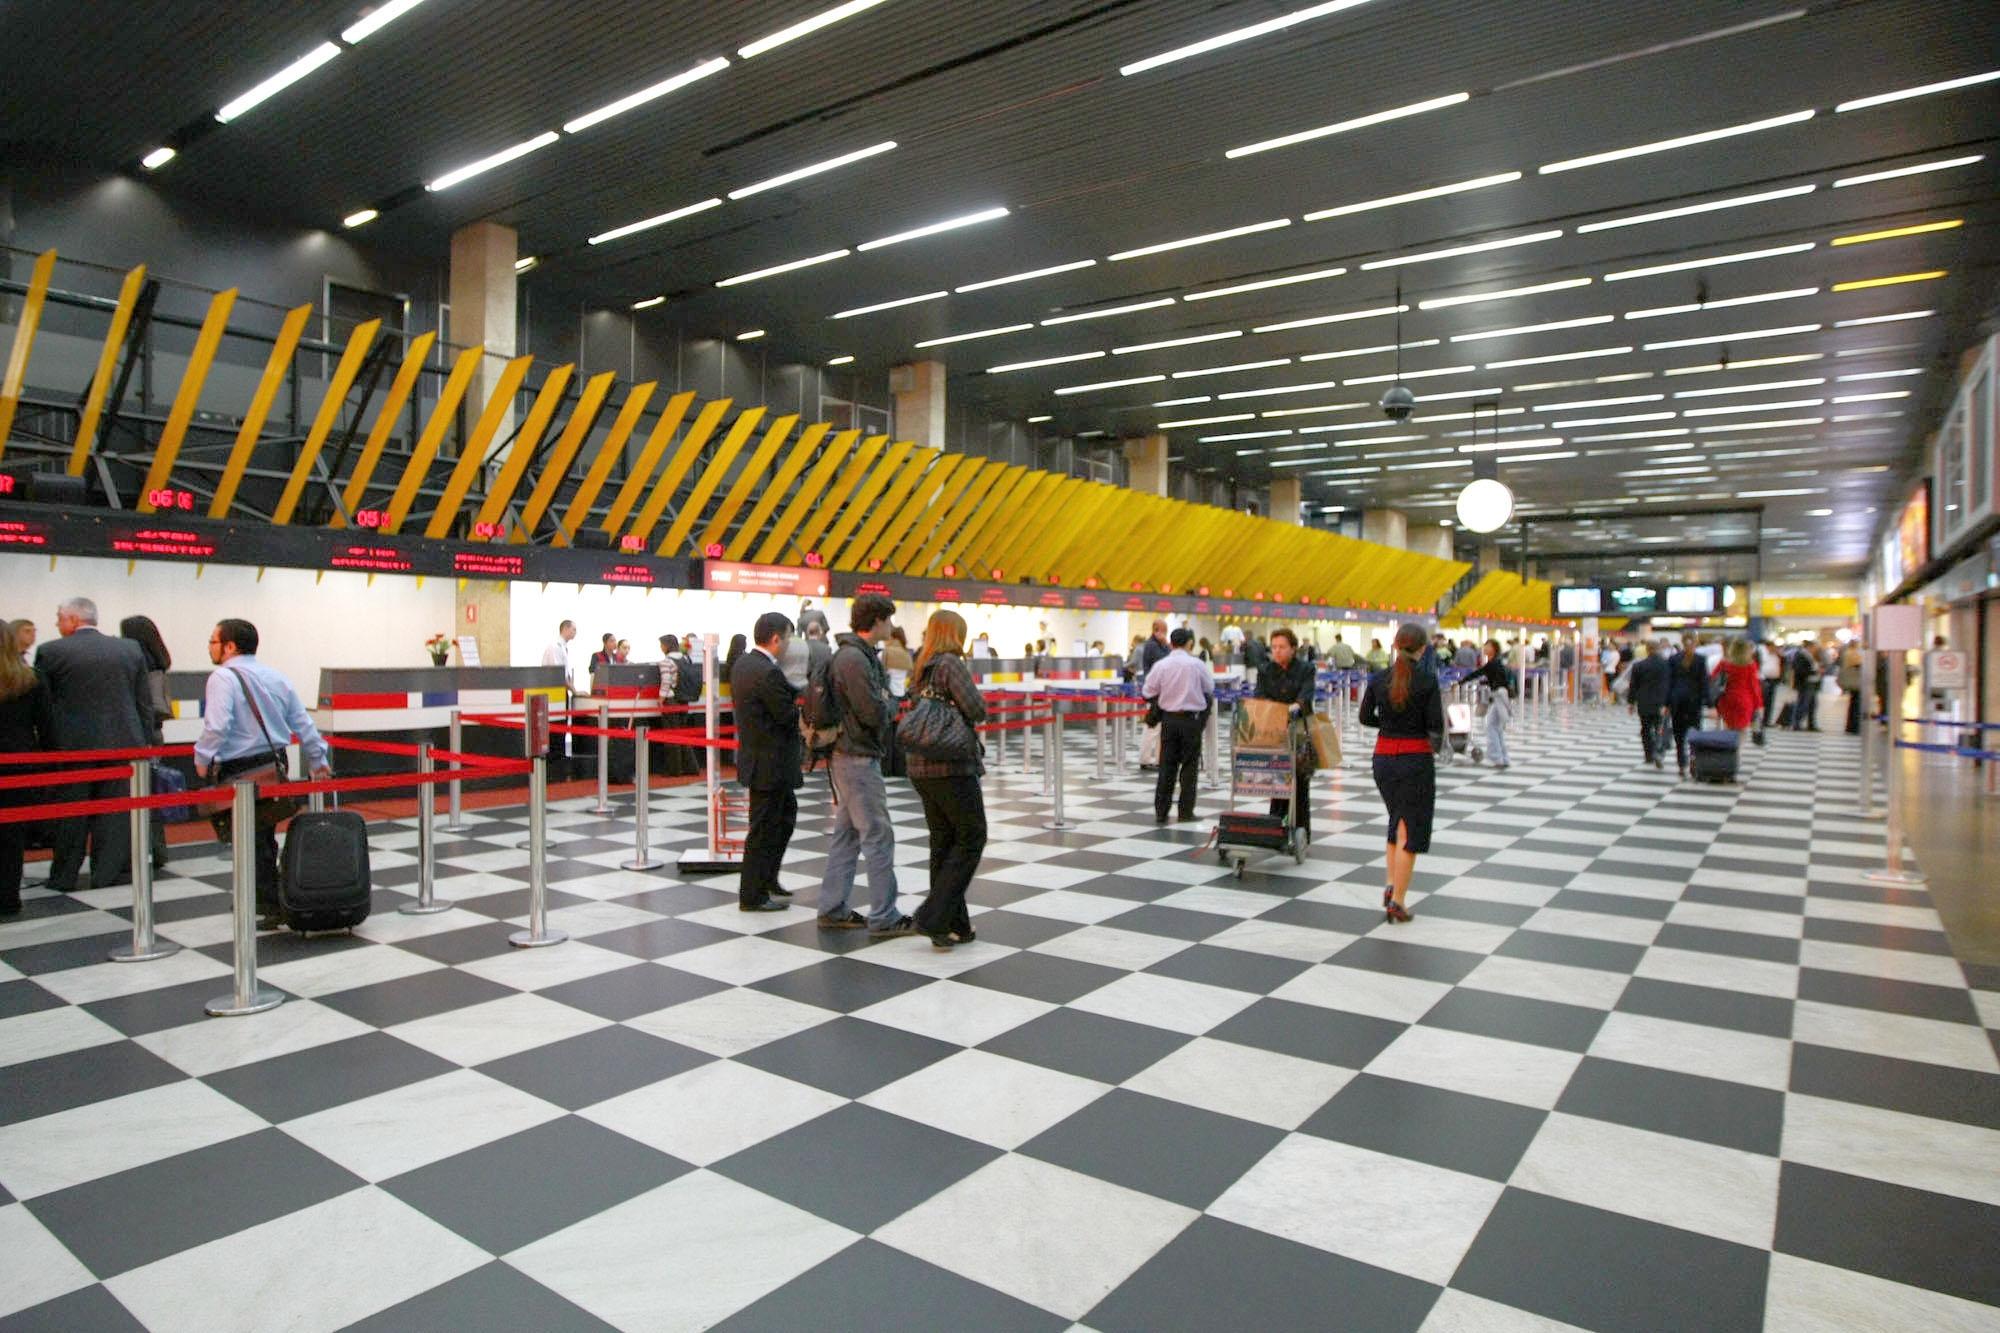 Aeroporto Sp : Lanchonete popular tem a preferência no aeroporto de sp inflyght